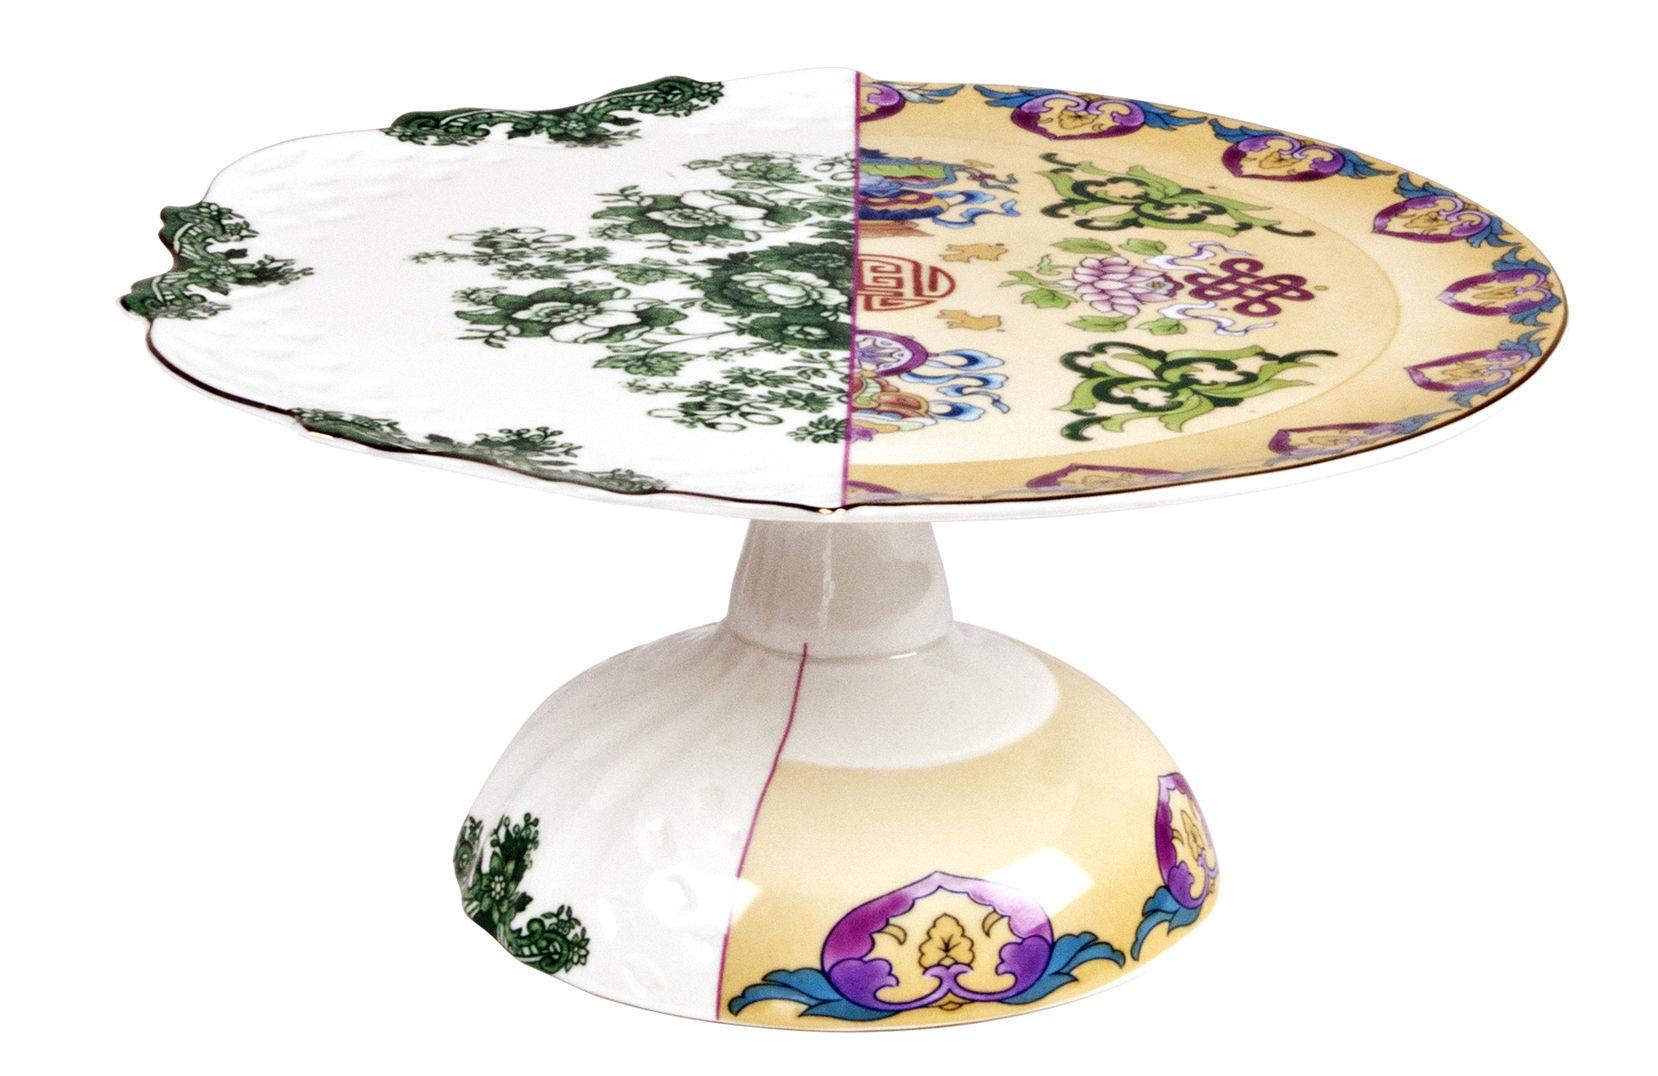 Tableware - Serving Plates - Hybrid Raissa Baking tray by Seletti - Multicolor - Bone china